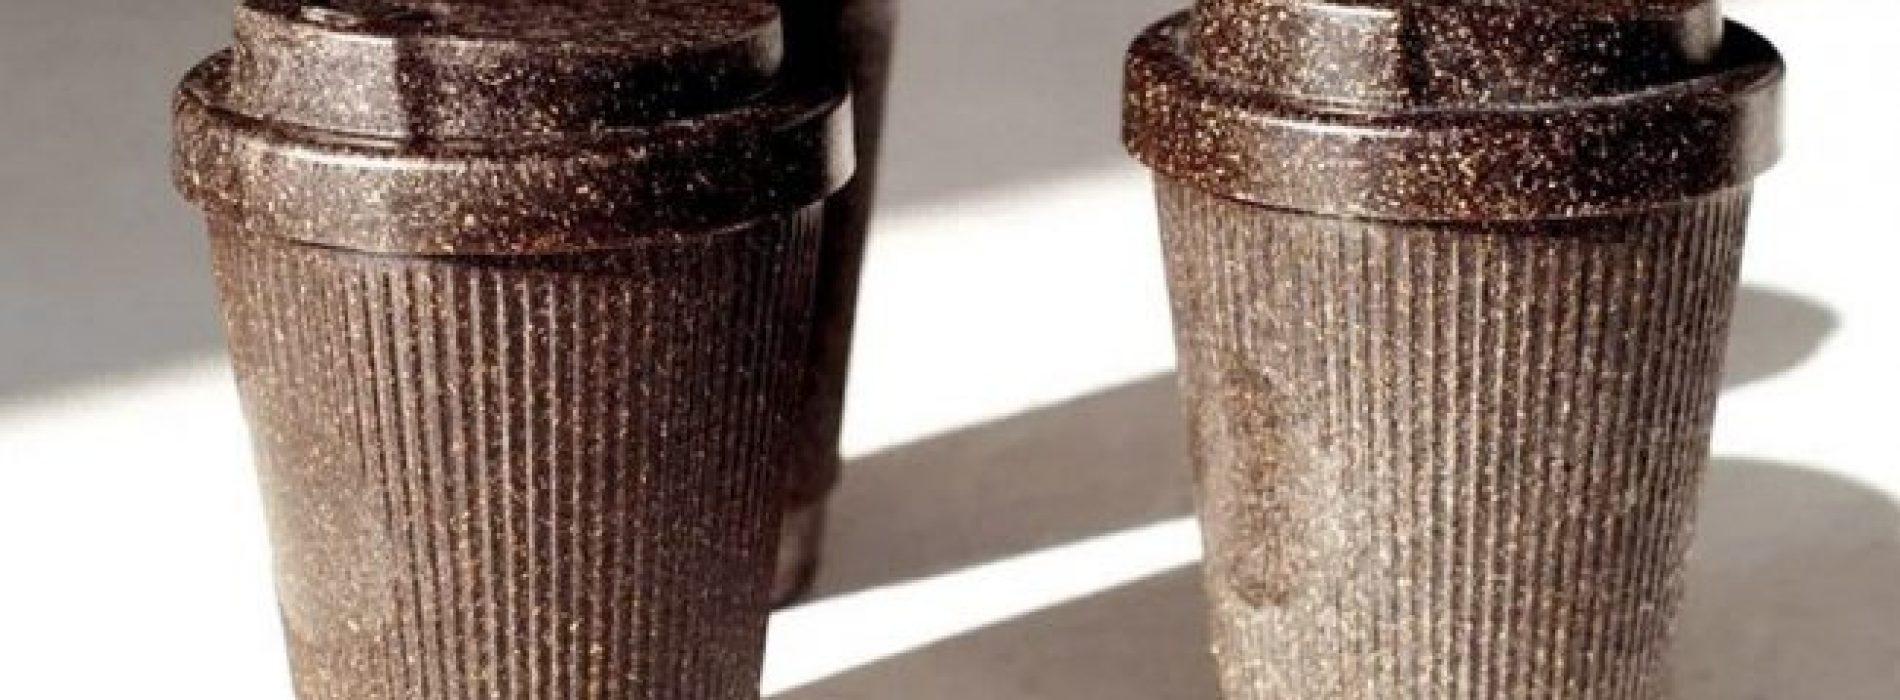 Dit Berlijnse bedrijf verandert koffiedik in gerecyclede herbruikbare bekers